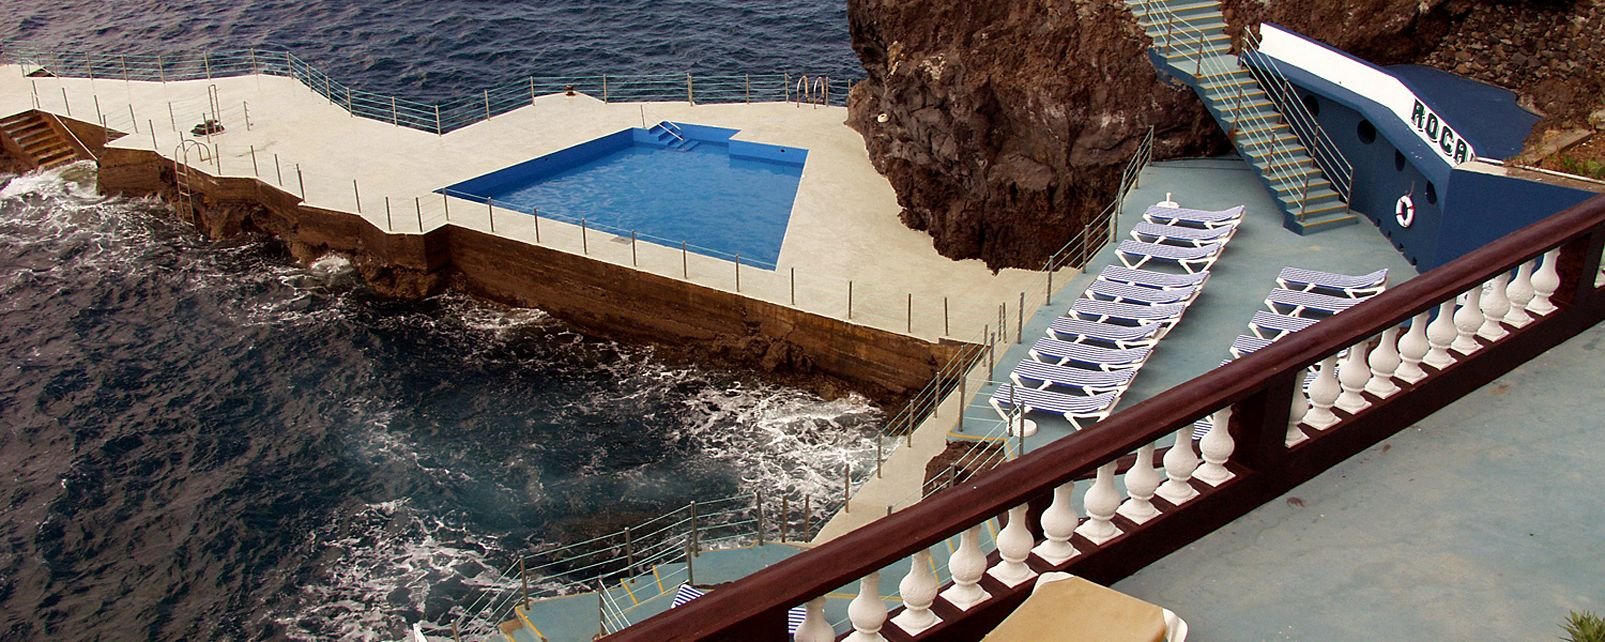 Ôclub Roca Mar